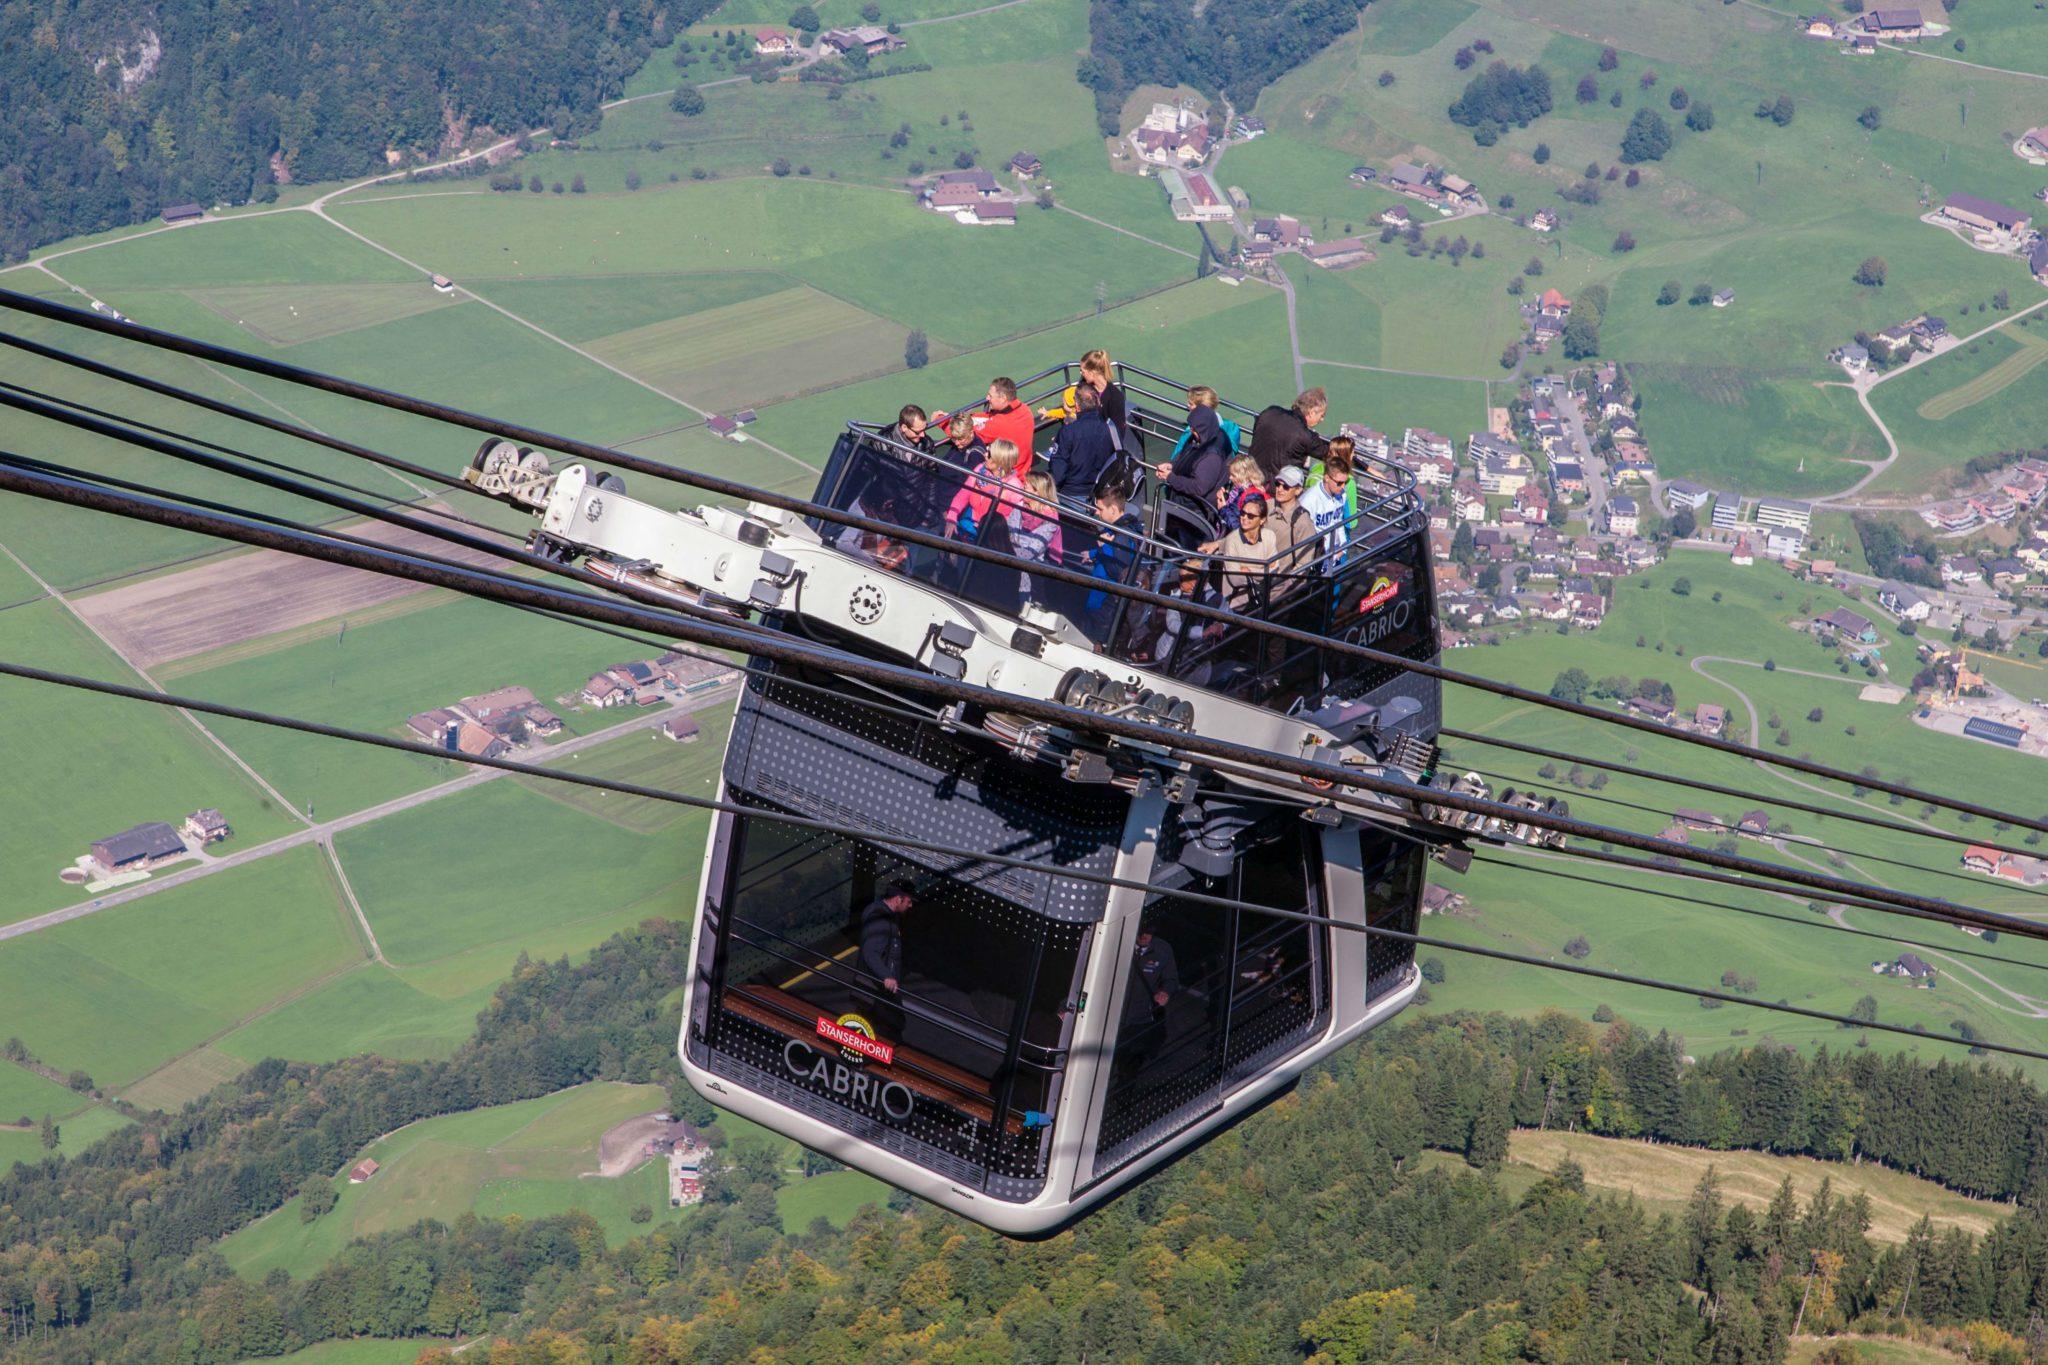 Kolejka na Stanserhorn